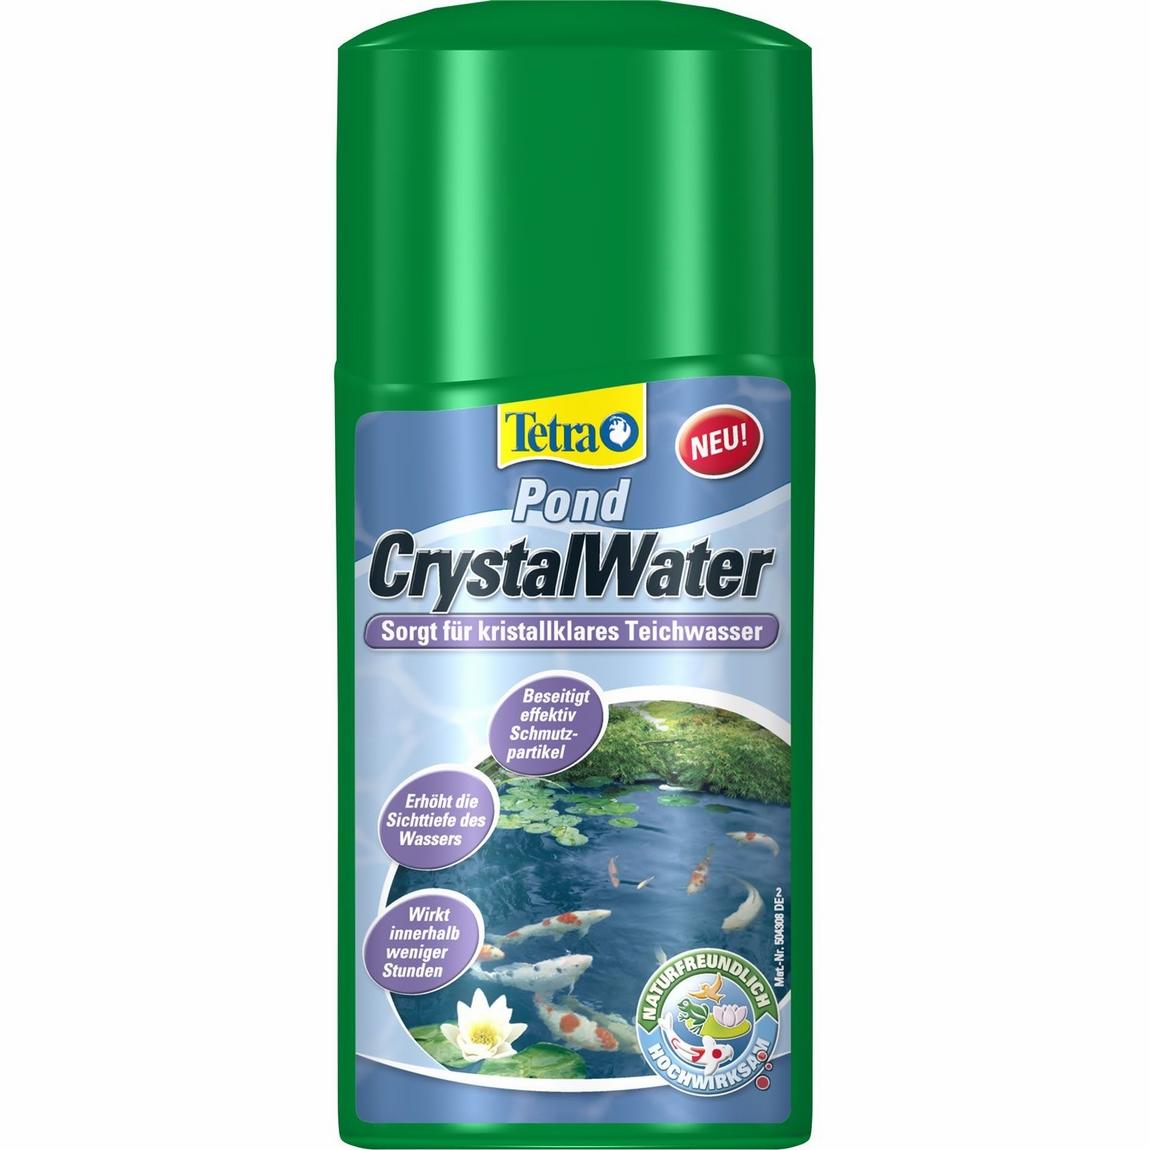 Tetrapond Crystal Water 250 ML imagine